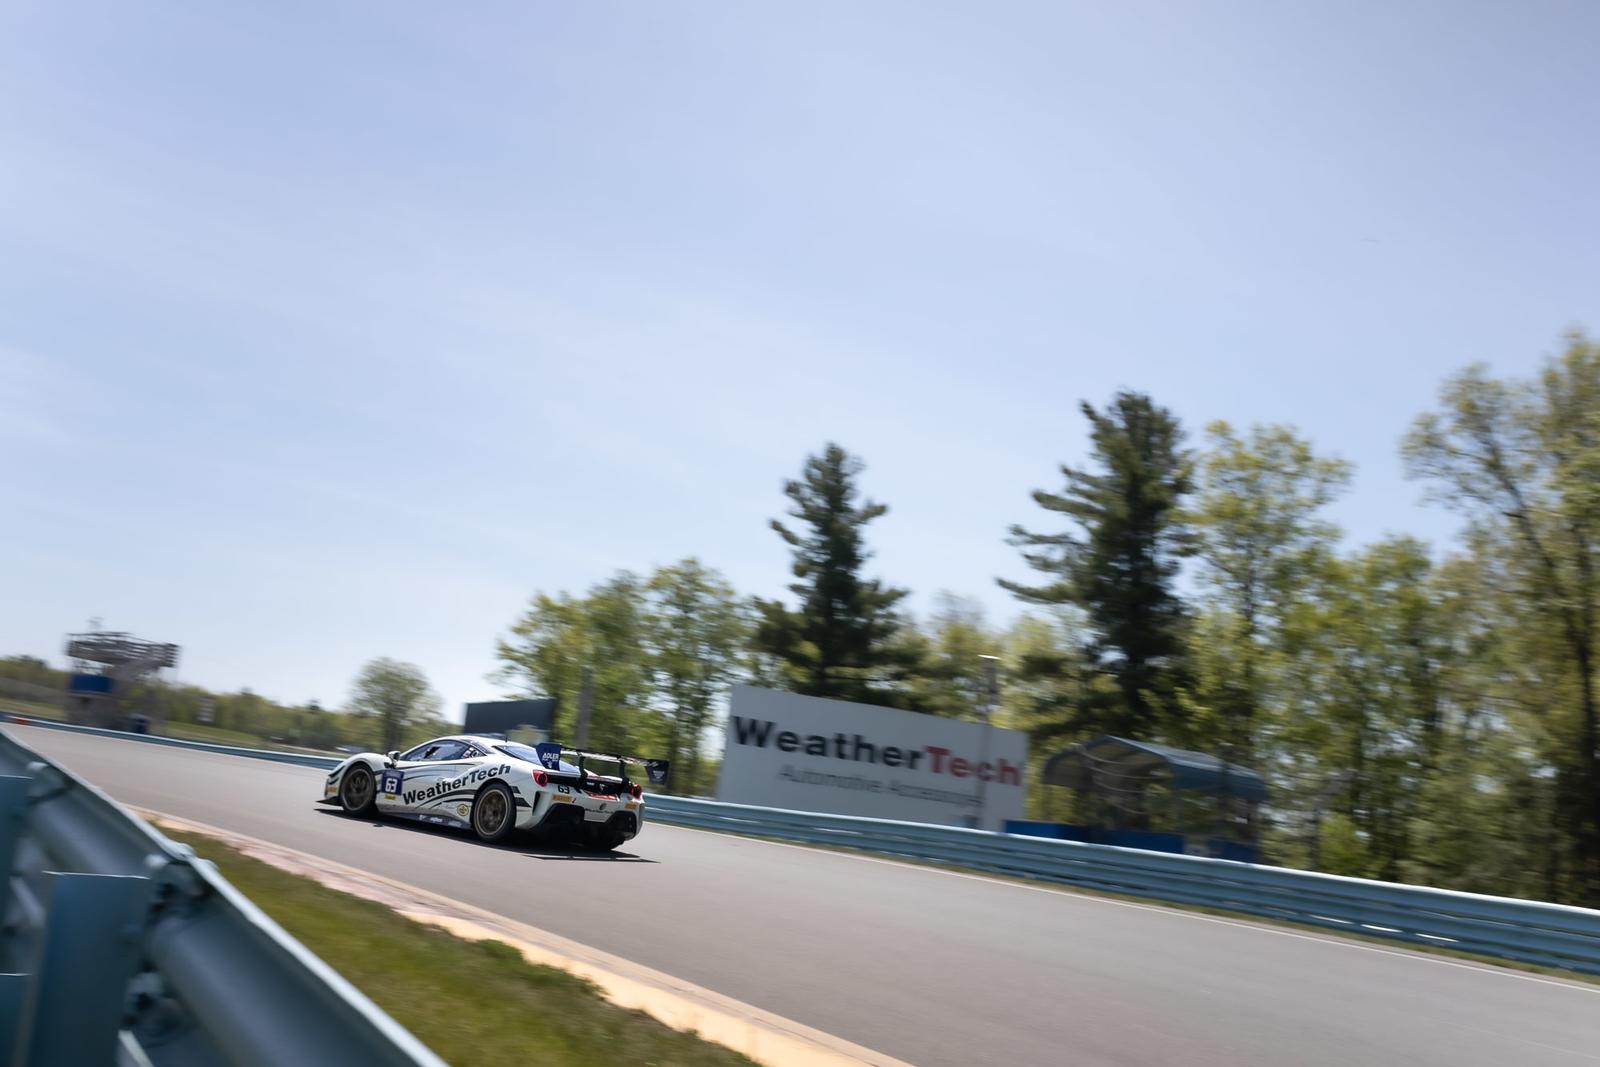 Ferrari tearing up a hill.